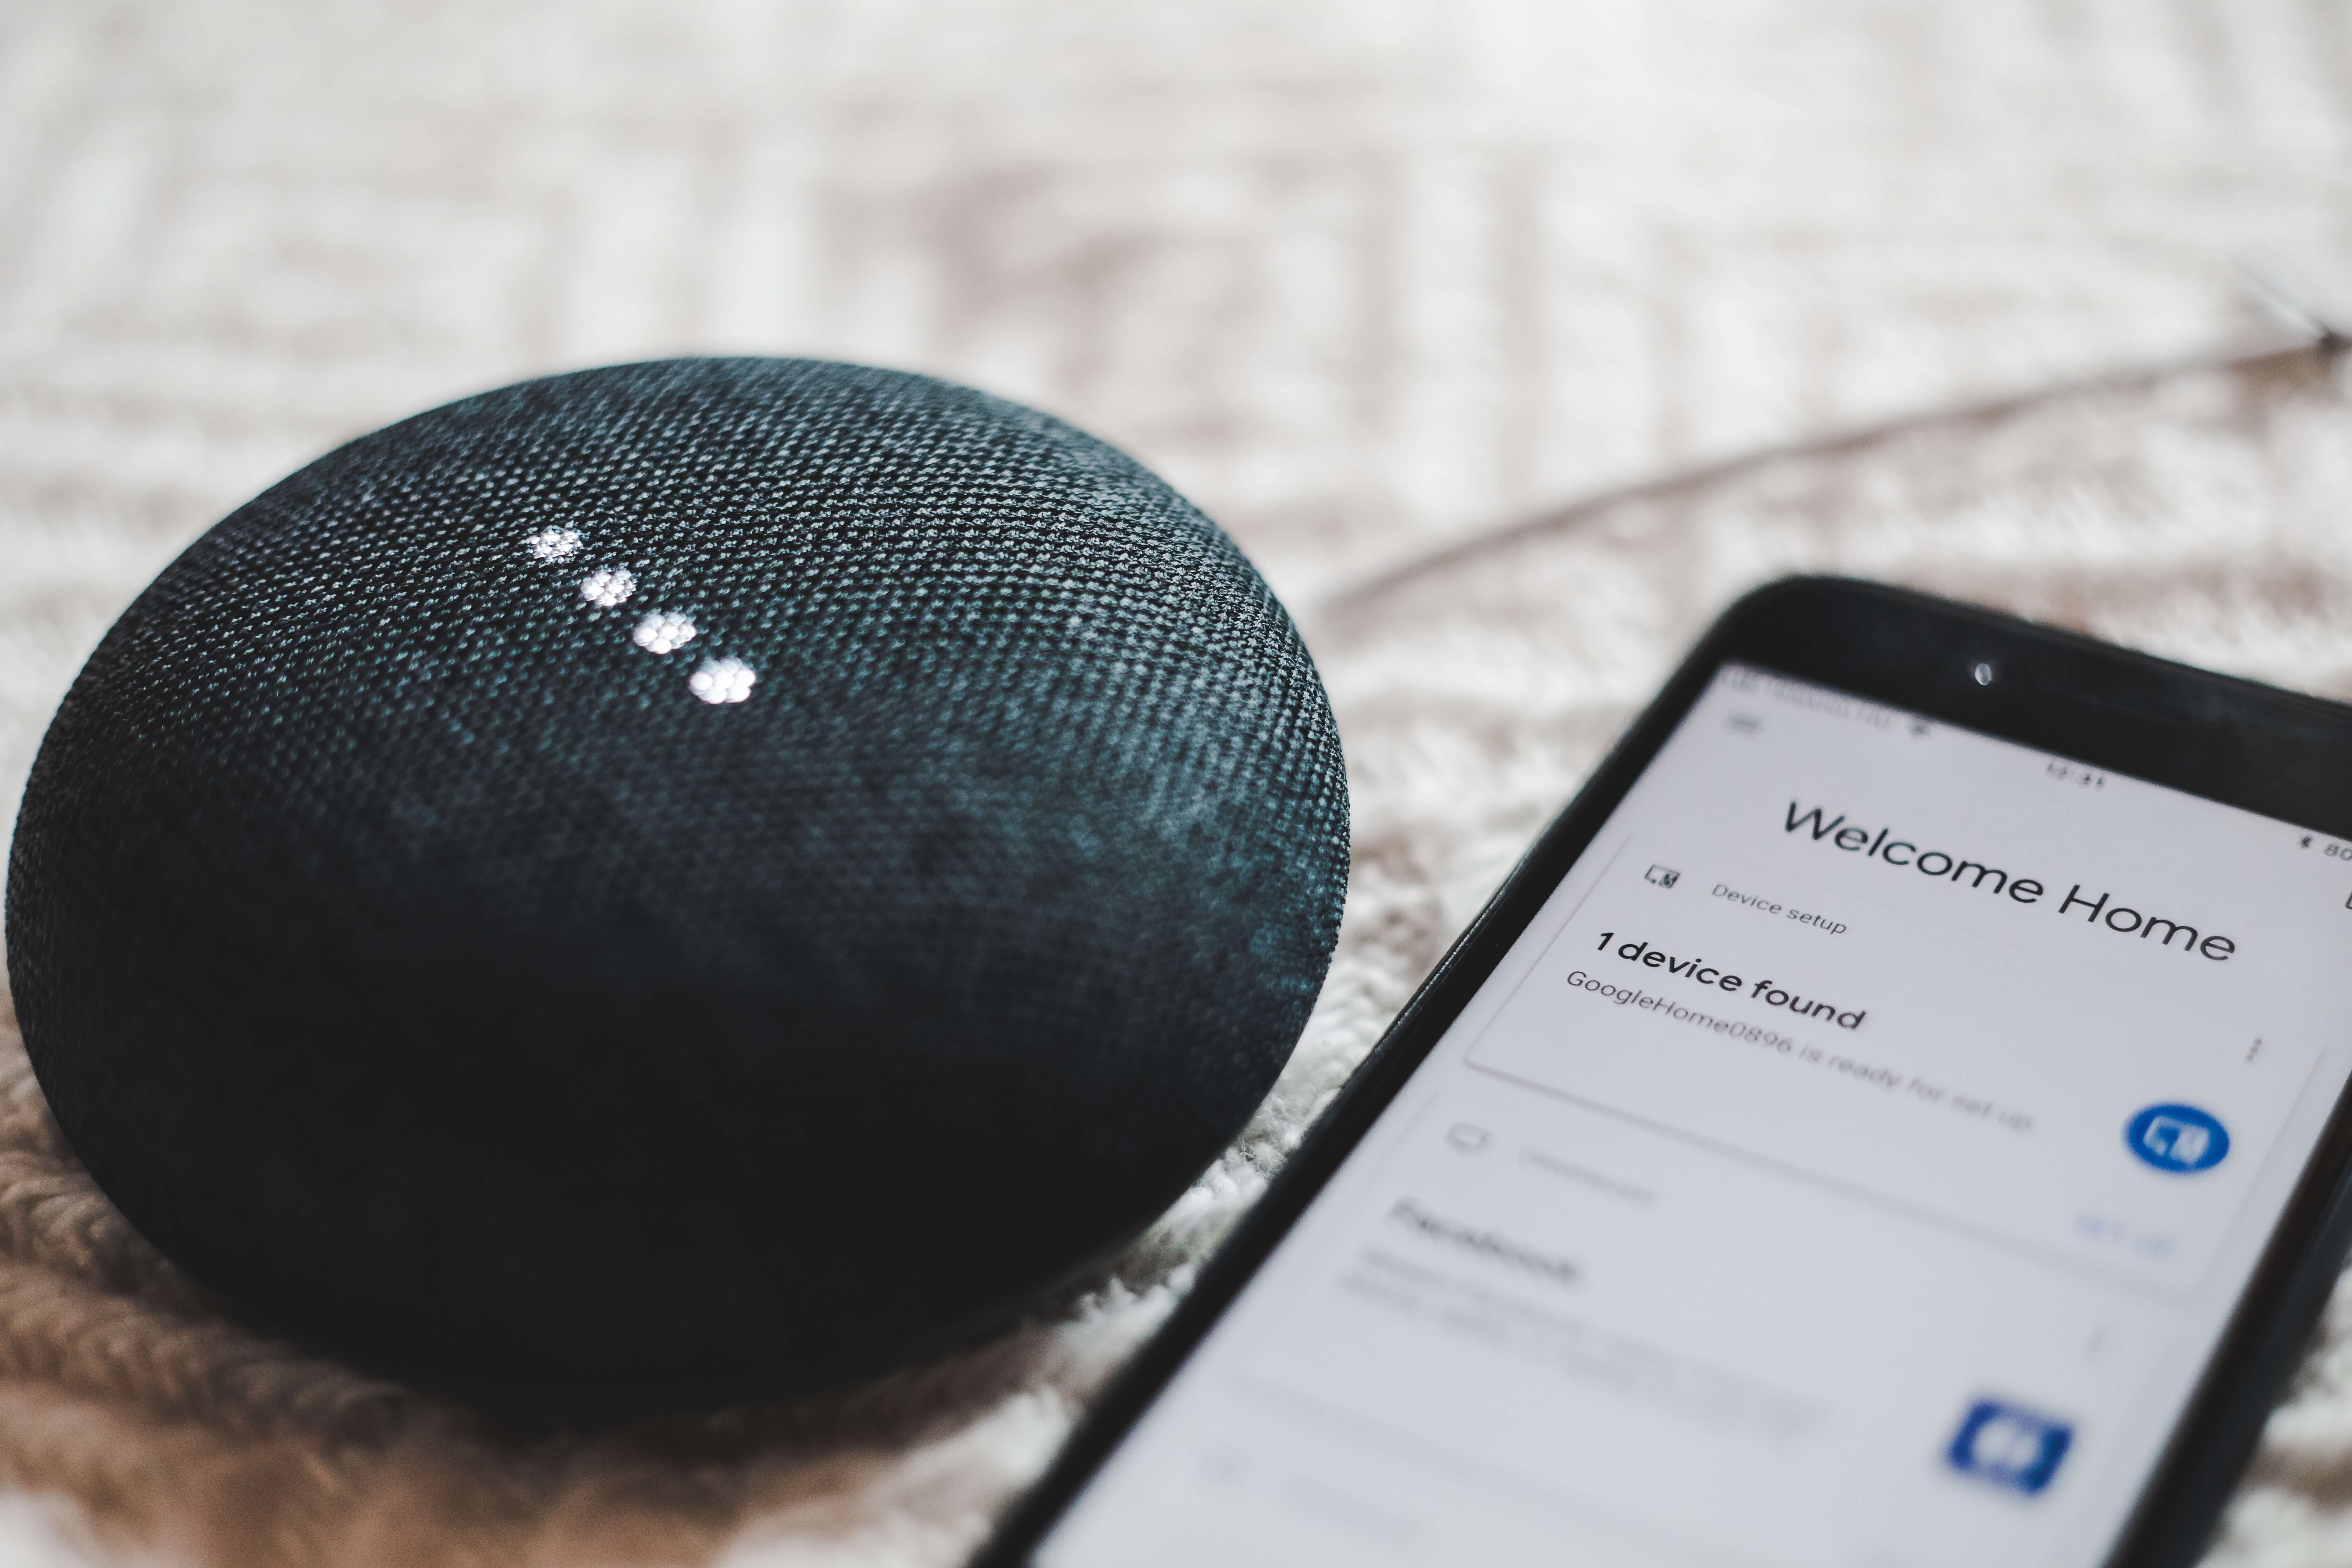 Casas inteligentes: 5 dispositivos para cambiar tu hogar